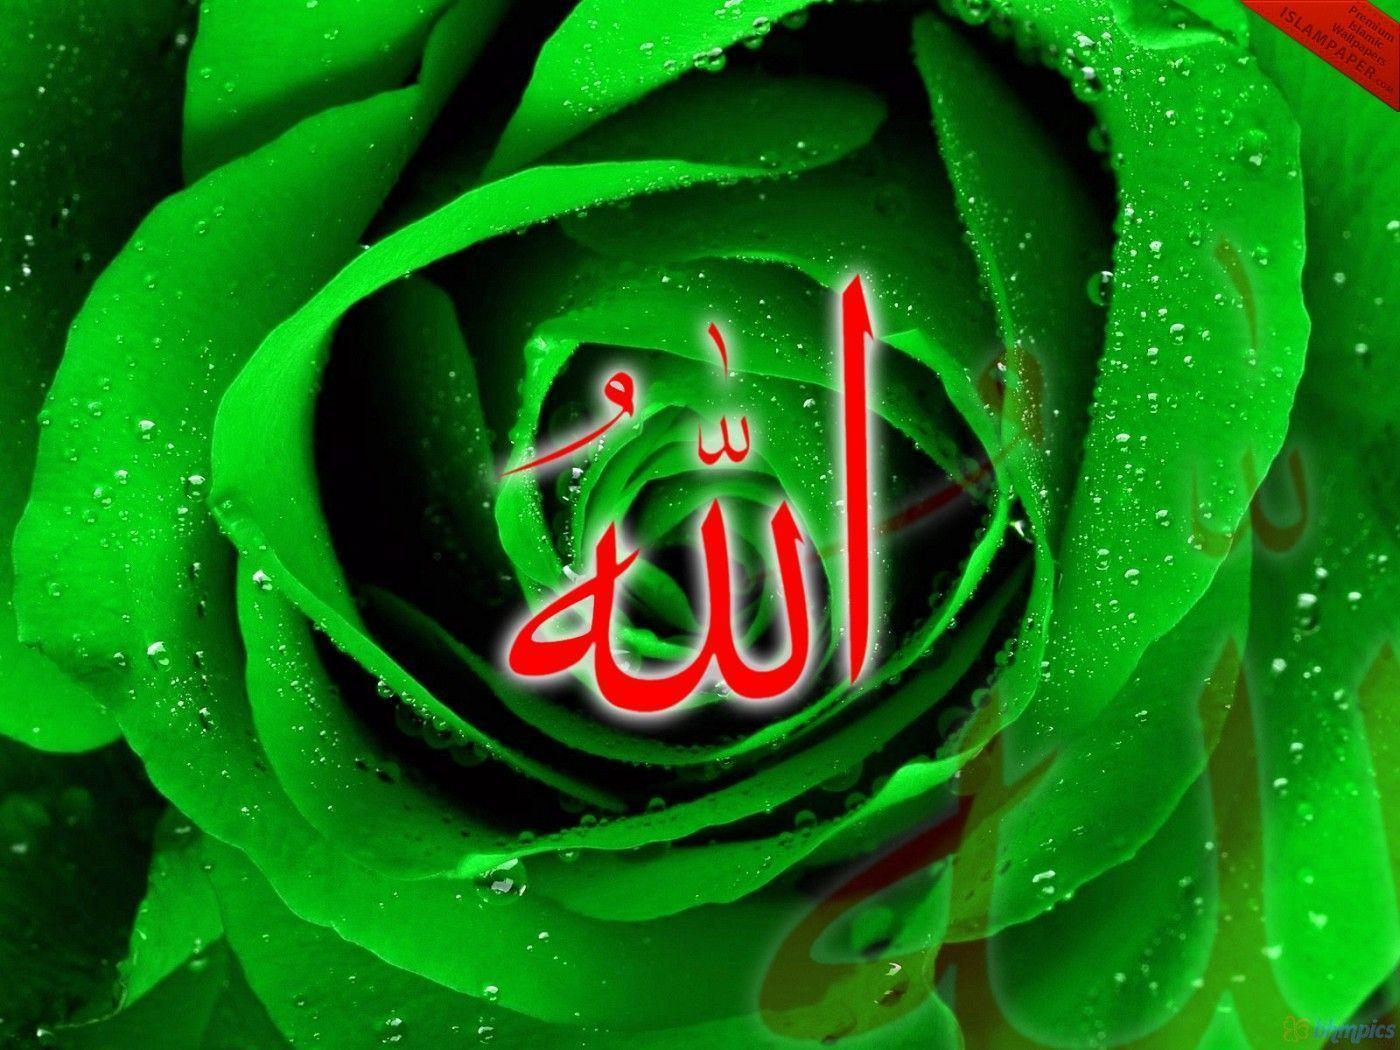 Allah Muhammad Wallpaper Animation Download I Love Allah And